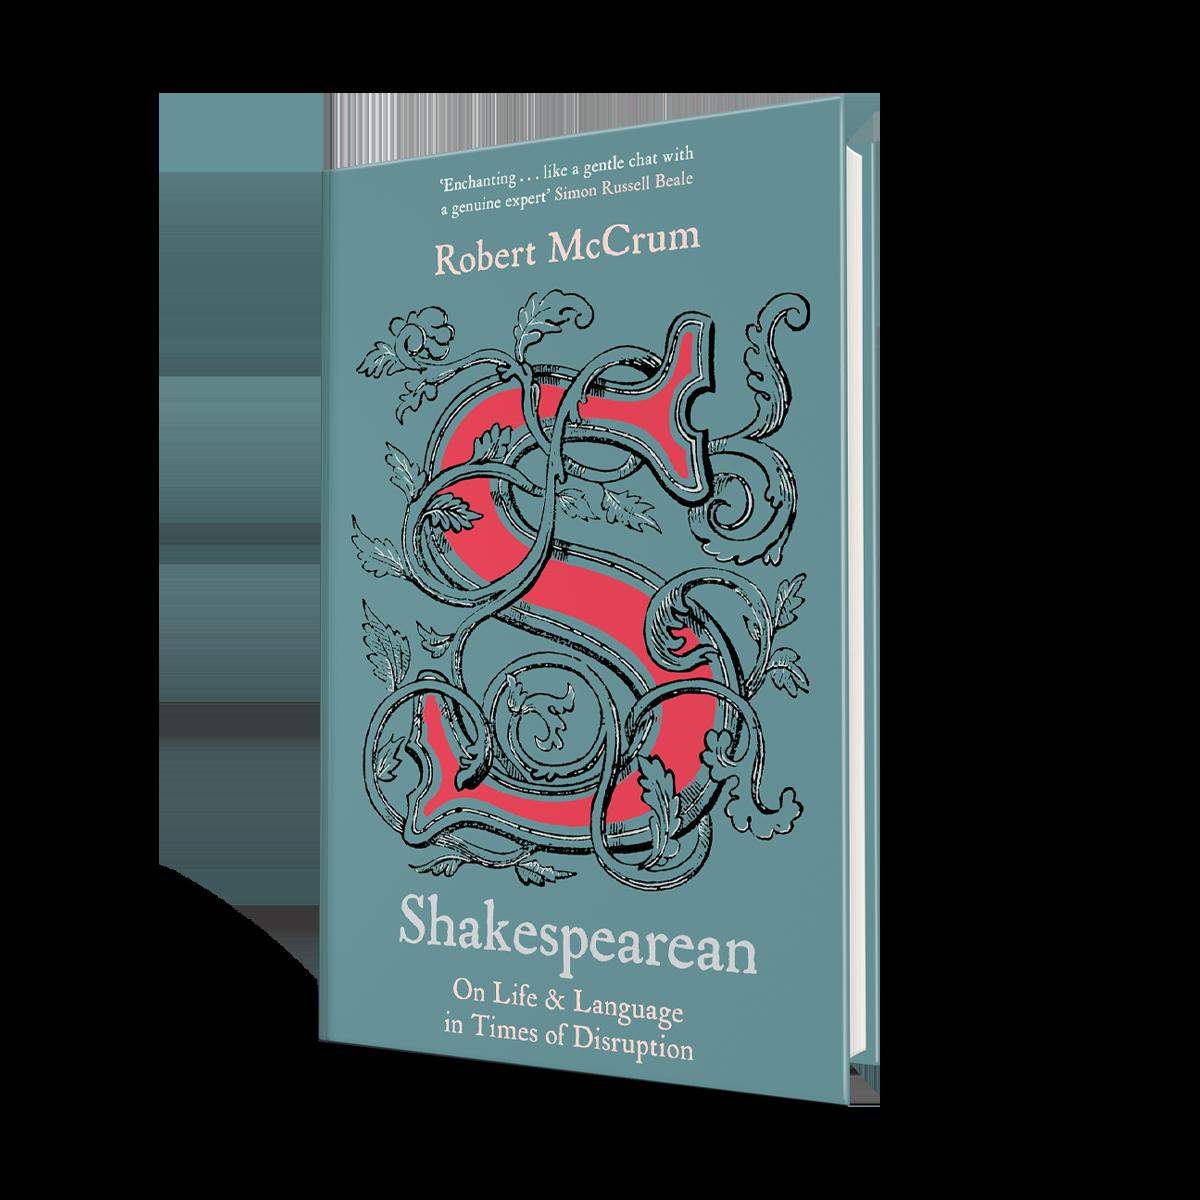 Shakespearean: On Life & Language in Times of Disruption (Hardback)